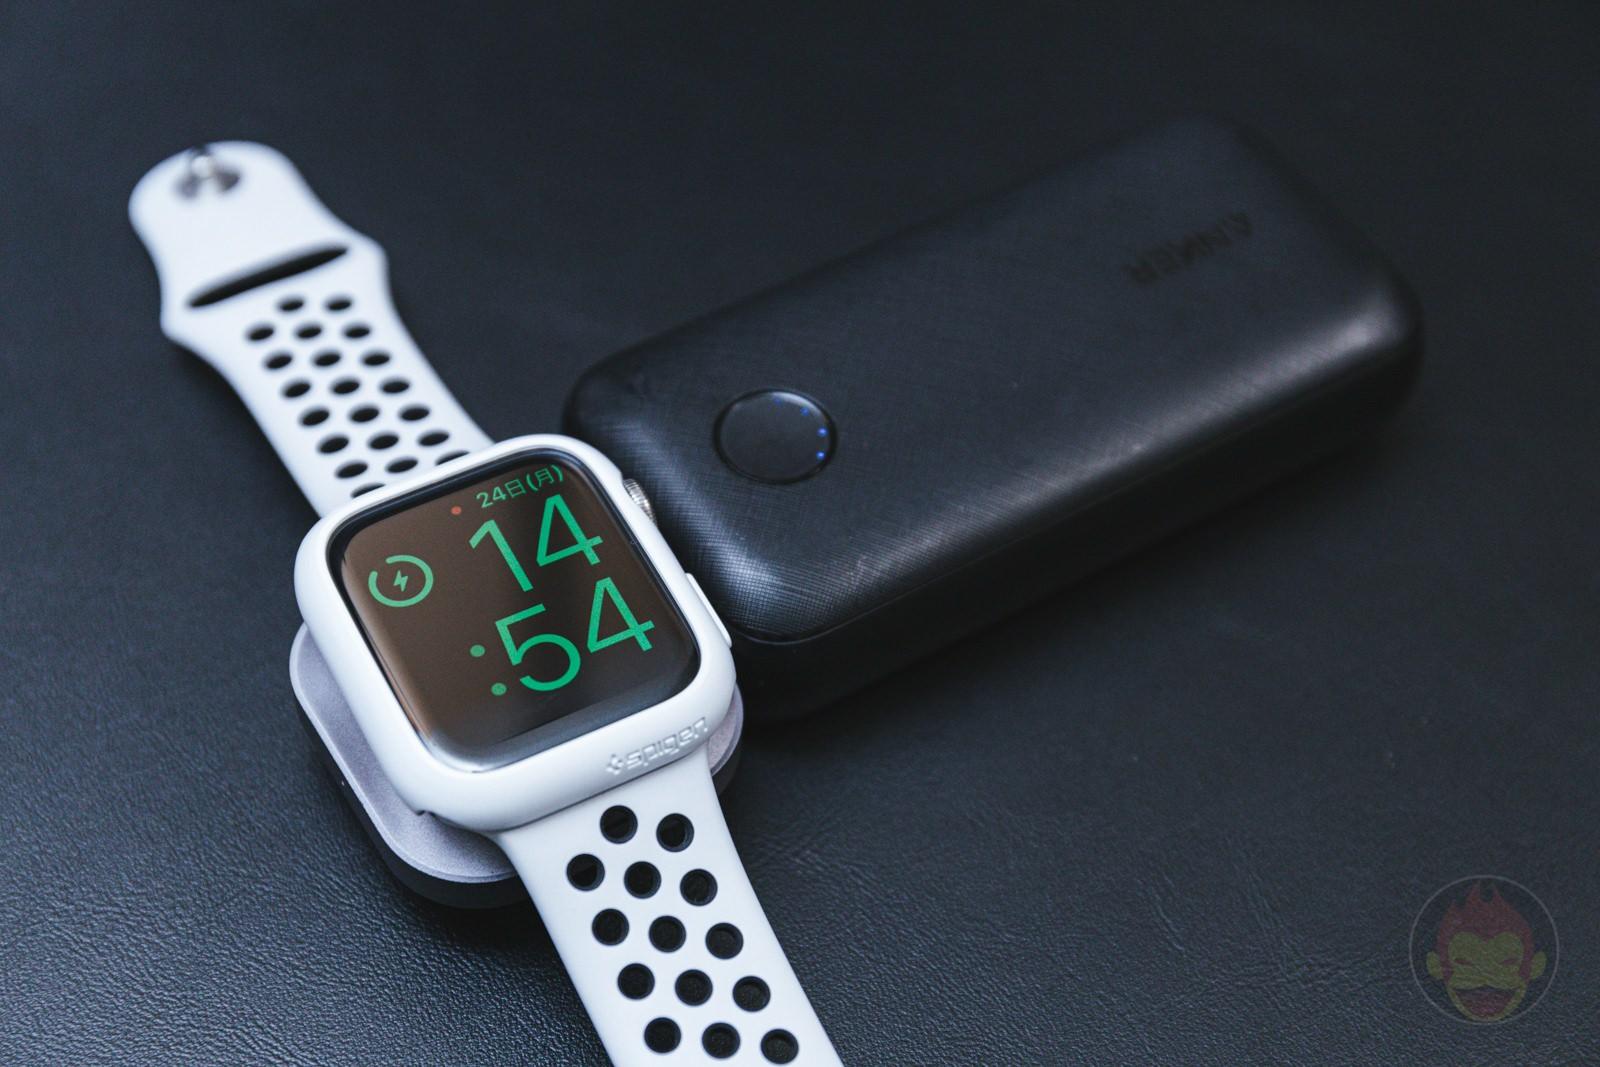 Satechi USB C Apple Watch Charging Dock 09